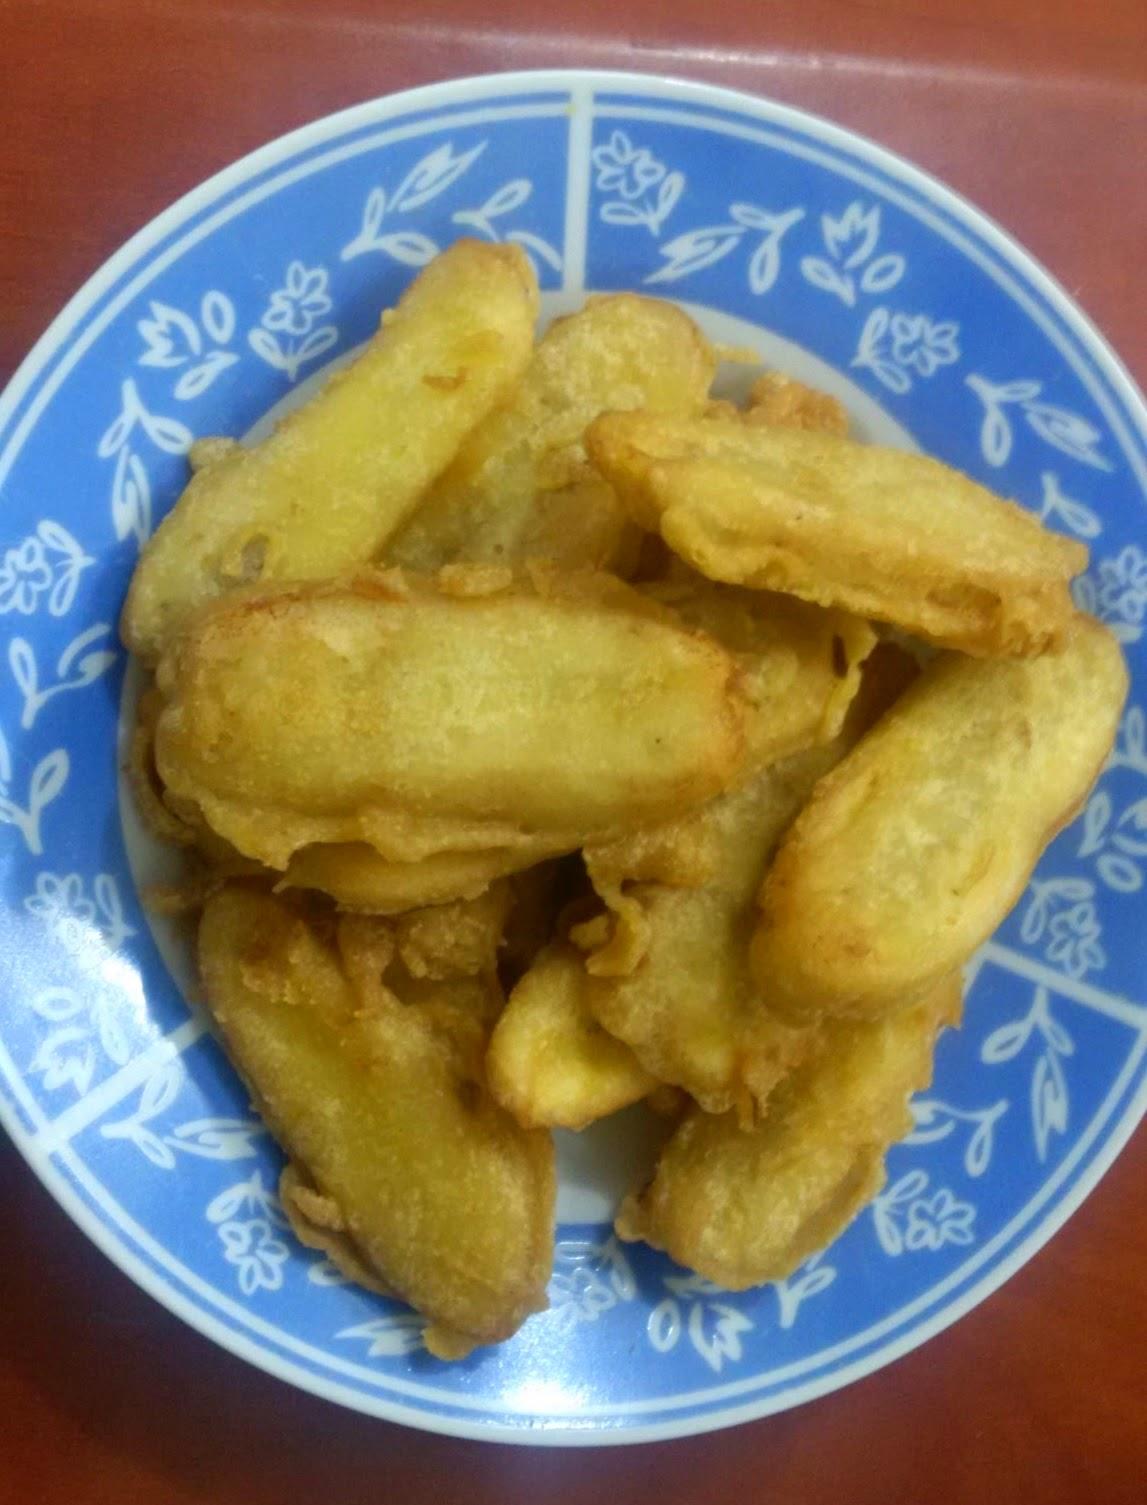 "banana fitters, food, goreng pisang, goreng pisang chesse, goreng pisang chocolate, malaysian snack, ""malaysia travel influencer,  malaysia influencer,  blog with cris,  malaysia blogger,  malaysia freelance model,  crispy banana fry,  raw banana fry kerala style,  raw banana fry raks kitchen,  raw banana fry yummy tummy,  banana fry recipe tamilnadu style,  raw banana fry calories,  raw banana palya,  raw banana recipes hebbars kitchen,  crispy banana fry,  raw banana kofta,  raw banana recipes bengali style,  raw banana recipes kerala,  ripe banana fry,  raw banana chips,  banana fry recipe tamilnadu style,  raw banana fry kerala style,  sweet banana fry,  pazham pori with atta,  raw banana palya mangalore style,  raw banana fry raks kitchen,  raw banana fry andhra style,  aratikaya fry in abhiruchi,  raw banana curry bengali style,  raw banana curry kerala style,  raw banana konkani recipes,  balekai palya udupi style,  raw banana curry padhuskitchen,  raw banana kofta curry,  vazhakkai fry madras samayal,  banana curry,  banana fritters,  raw banana tawa fry,  raw banana fry padhuskitchen,  raw banana fry calories, step by step how to make banana fry,"